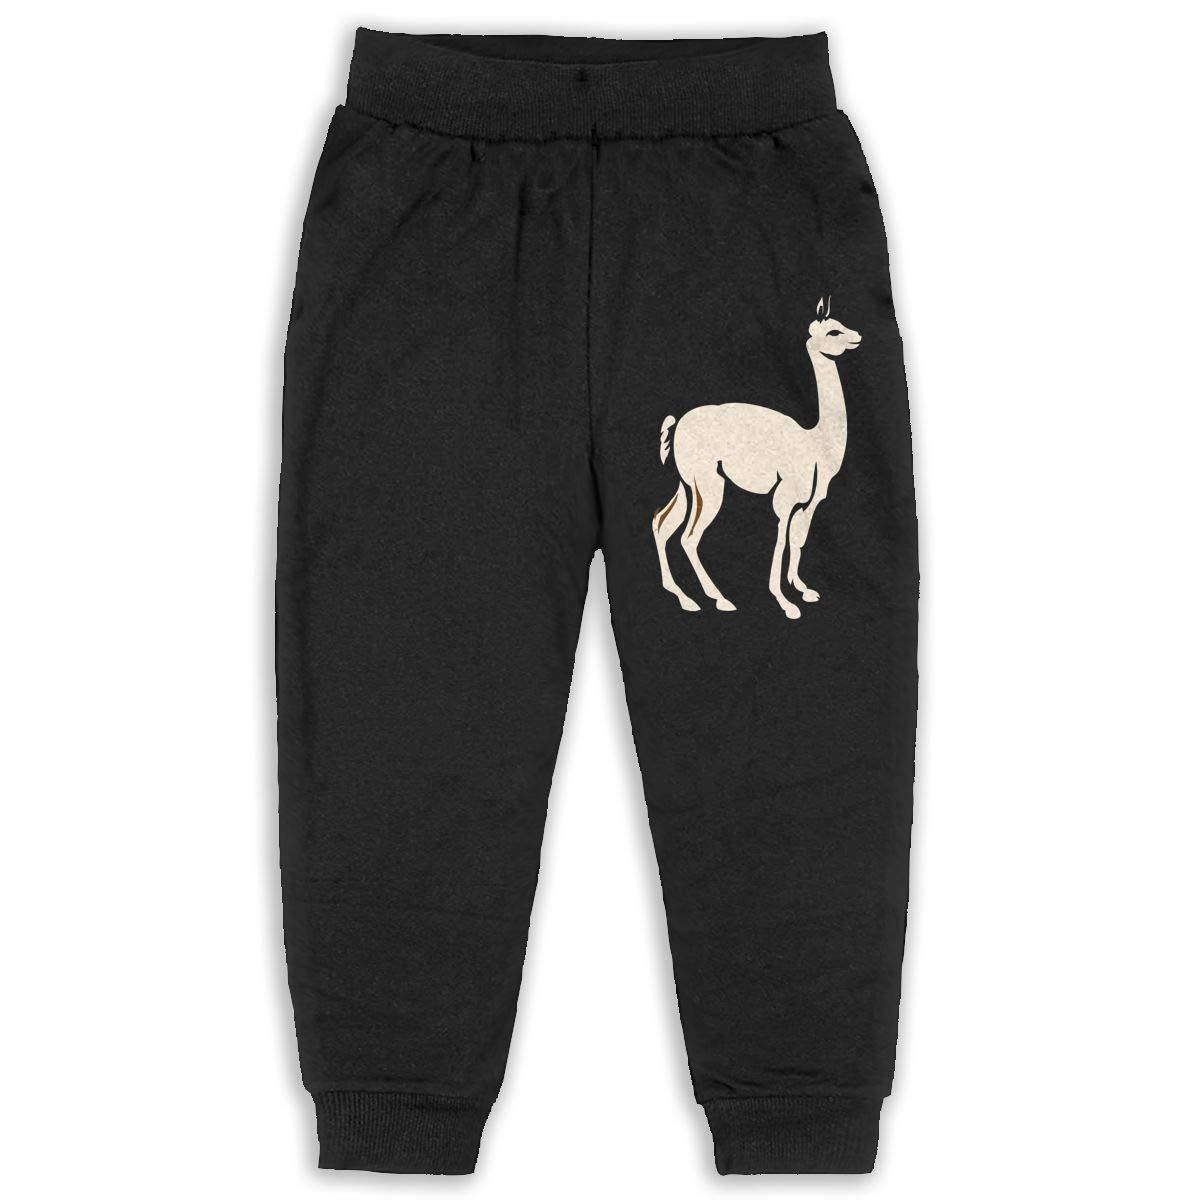 Fleece Active Joggers Elastic Pants DaXi1 Alpaca Sweatpants for Boys /& Girls